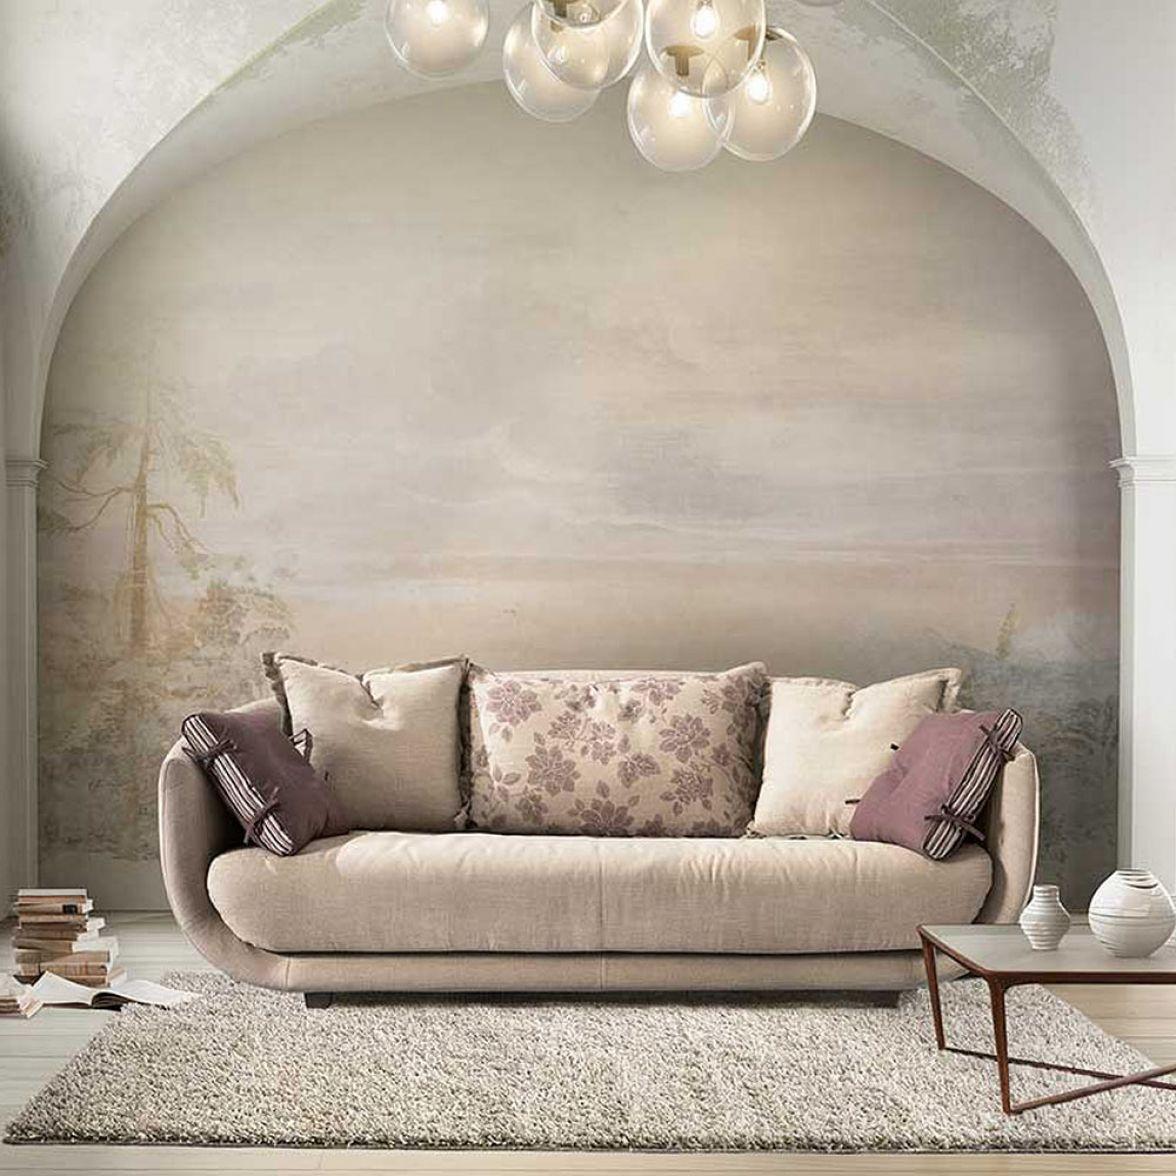 Panarea sofa фото цена